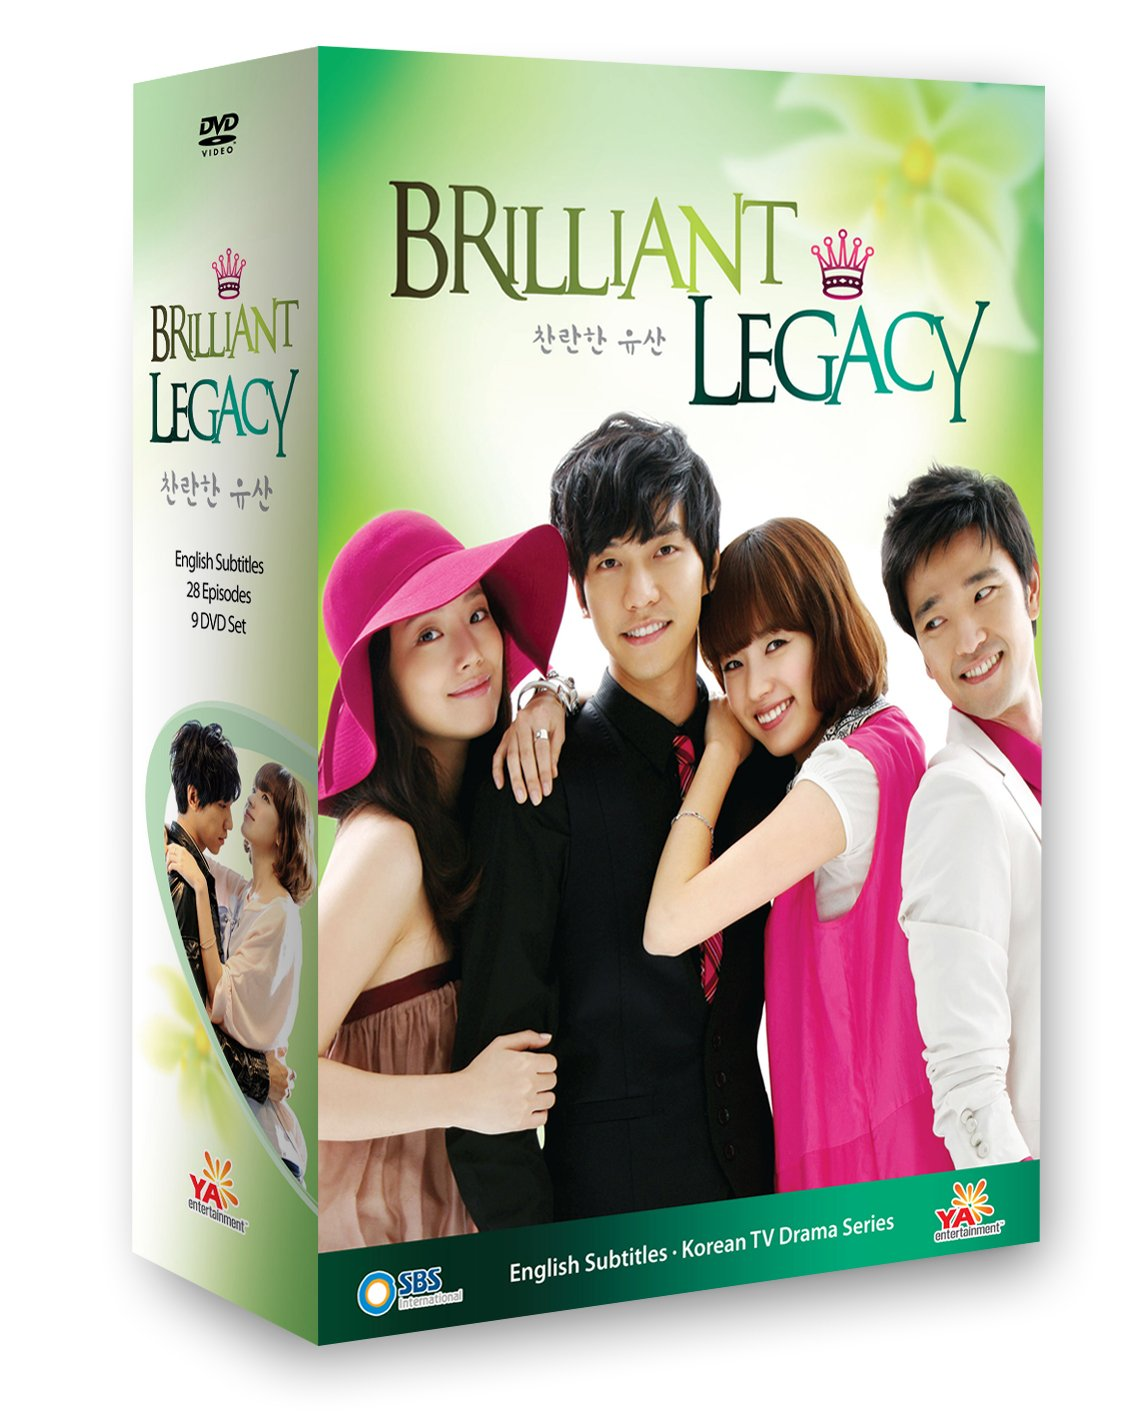 Brilliant Legacy AKA Shining Inheritance